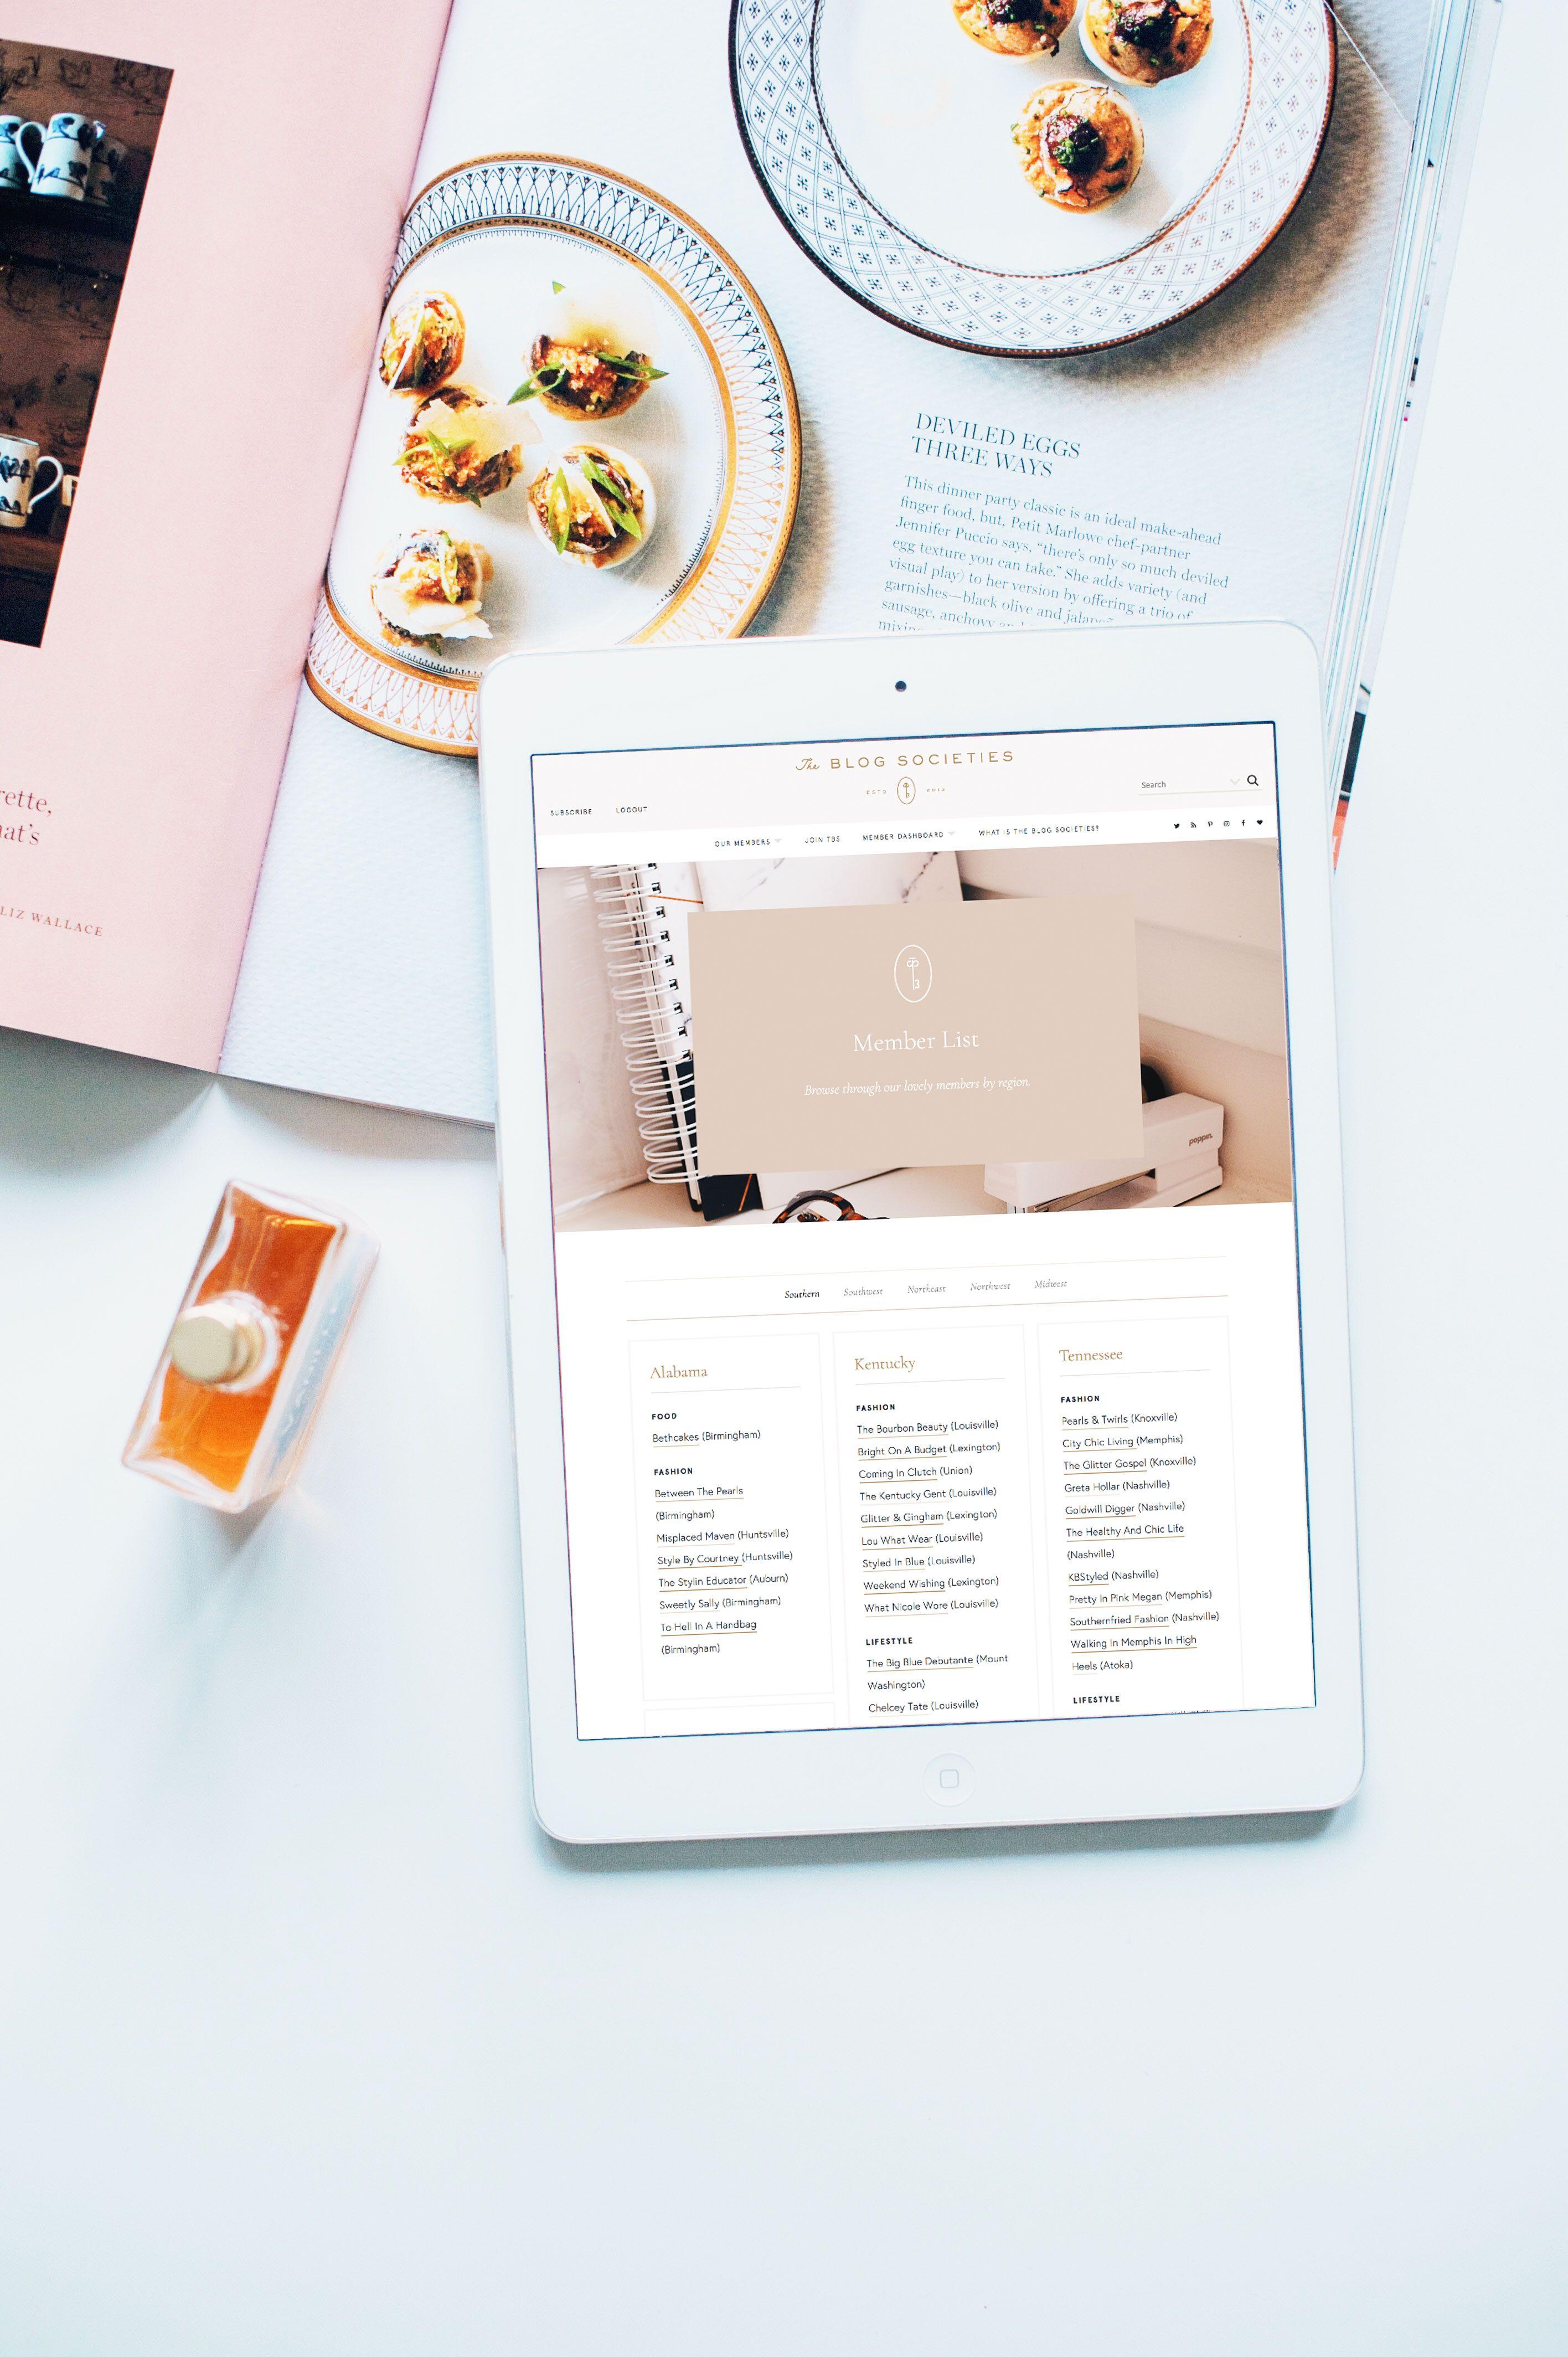 Brand Web Design For The Blog Societies By Wayfarer Design Studio Design Branding Br Shopify Website Design Wordpress Website Design Wordpress Web Design